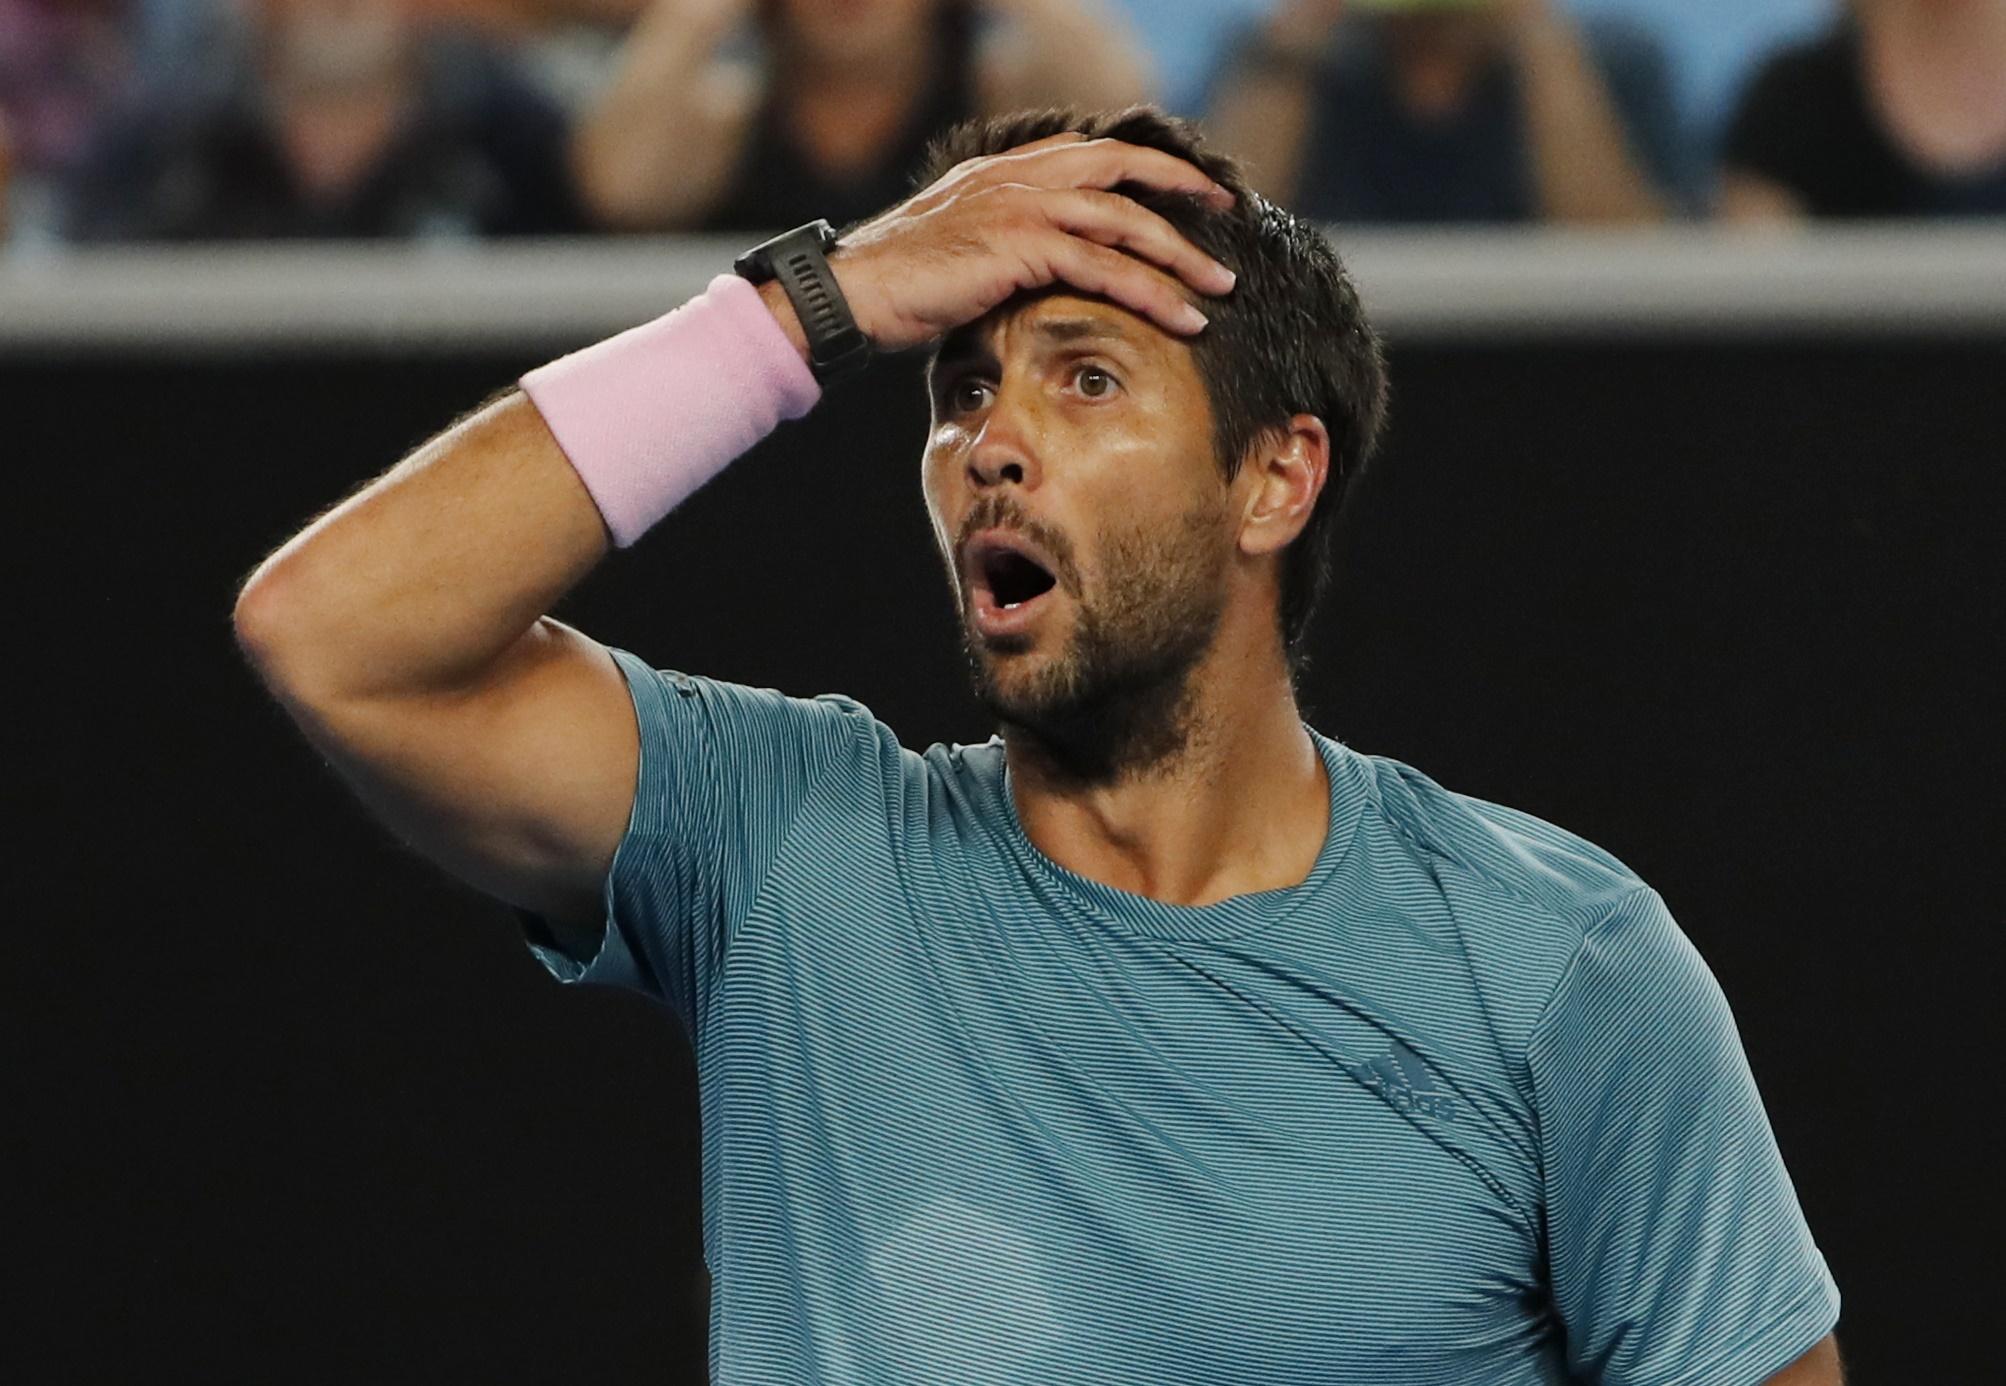 Tennis - Australian Open - Third Round - Melbourne Park, Melbourne, Australia, January 18, 2019. Spain's Fernando Verdasco reacts during the match against Croatia's Marin Cilic. REUTERS/Adnan Abidi